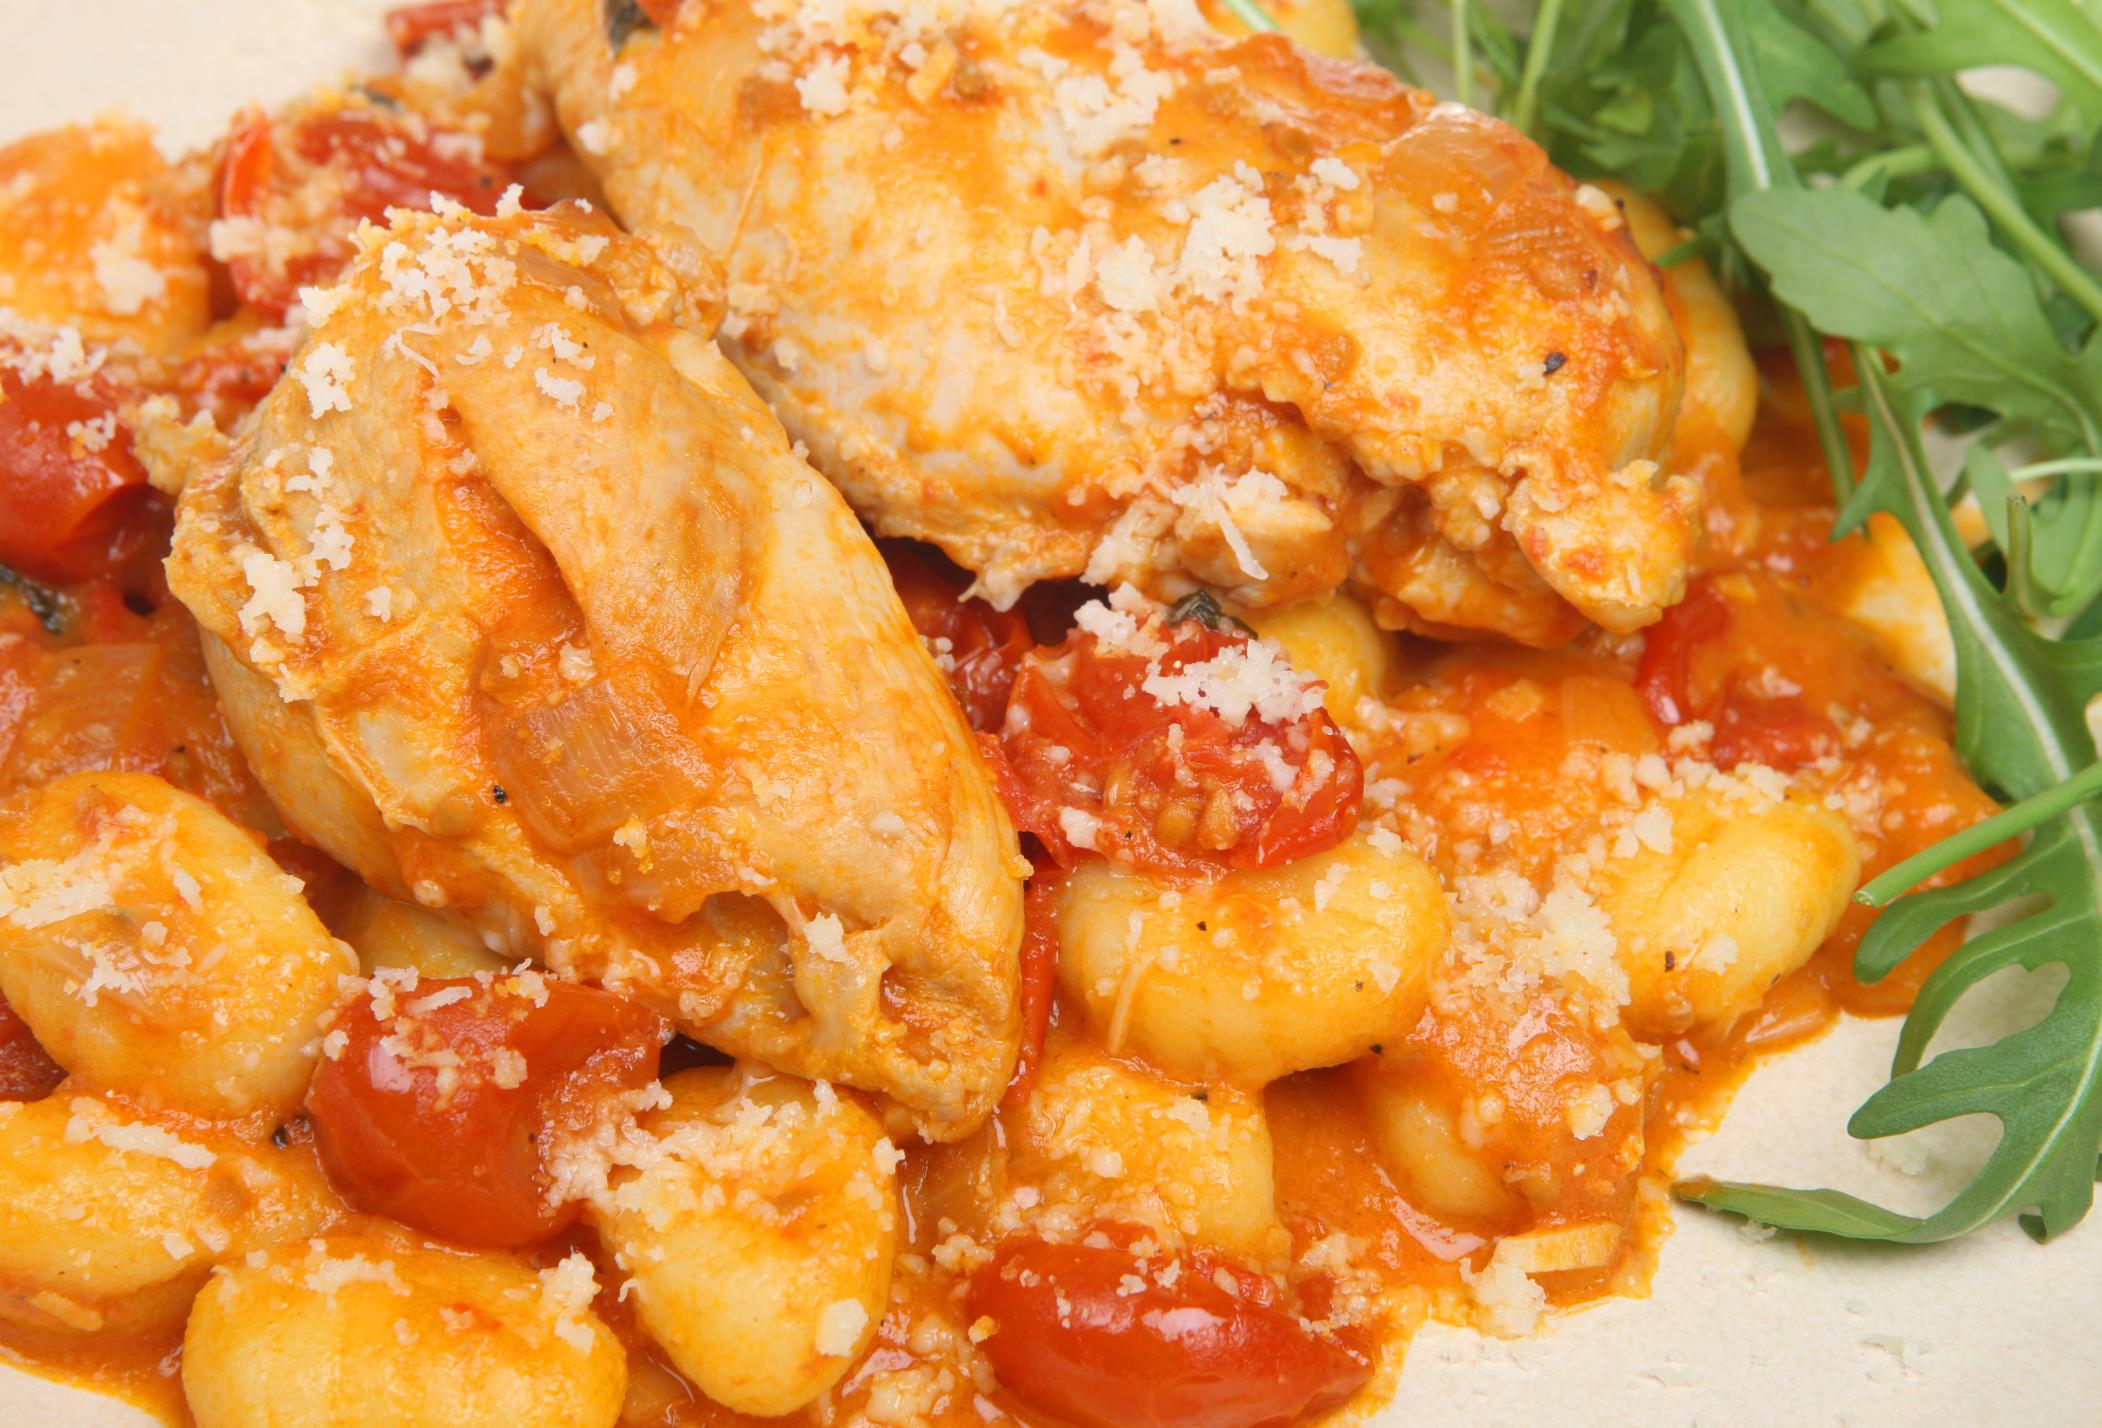 Ñoquis con trozos de pollo sin piel en salsa de tomates